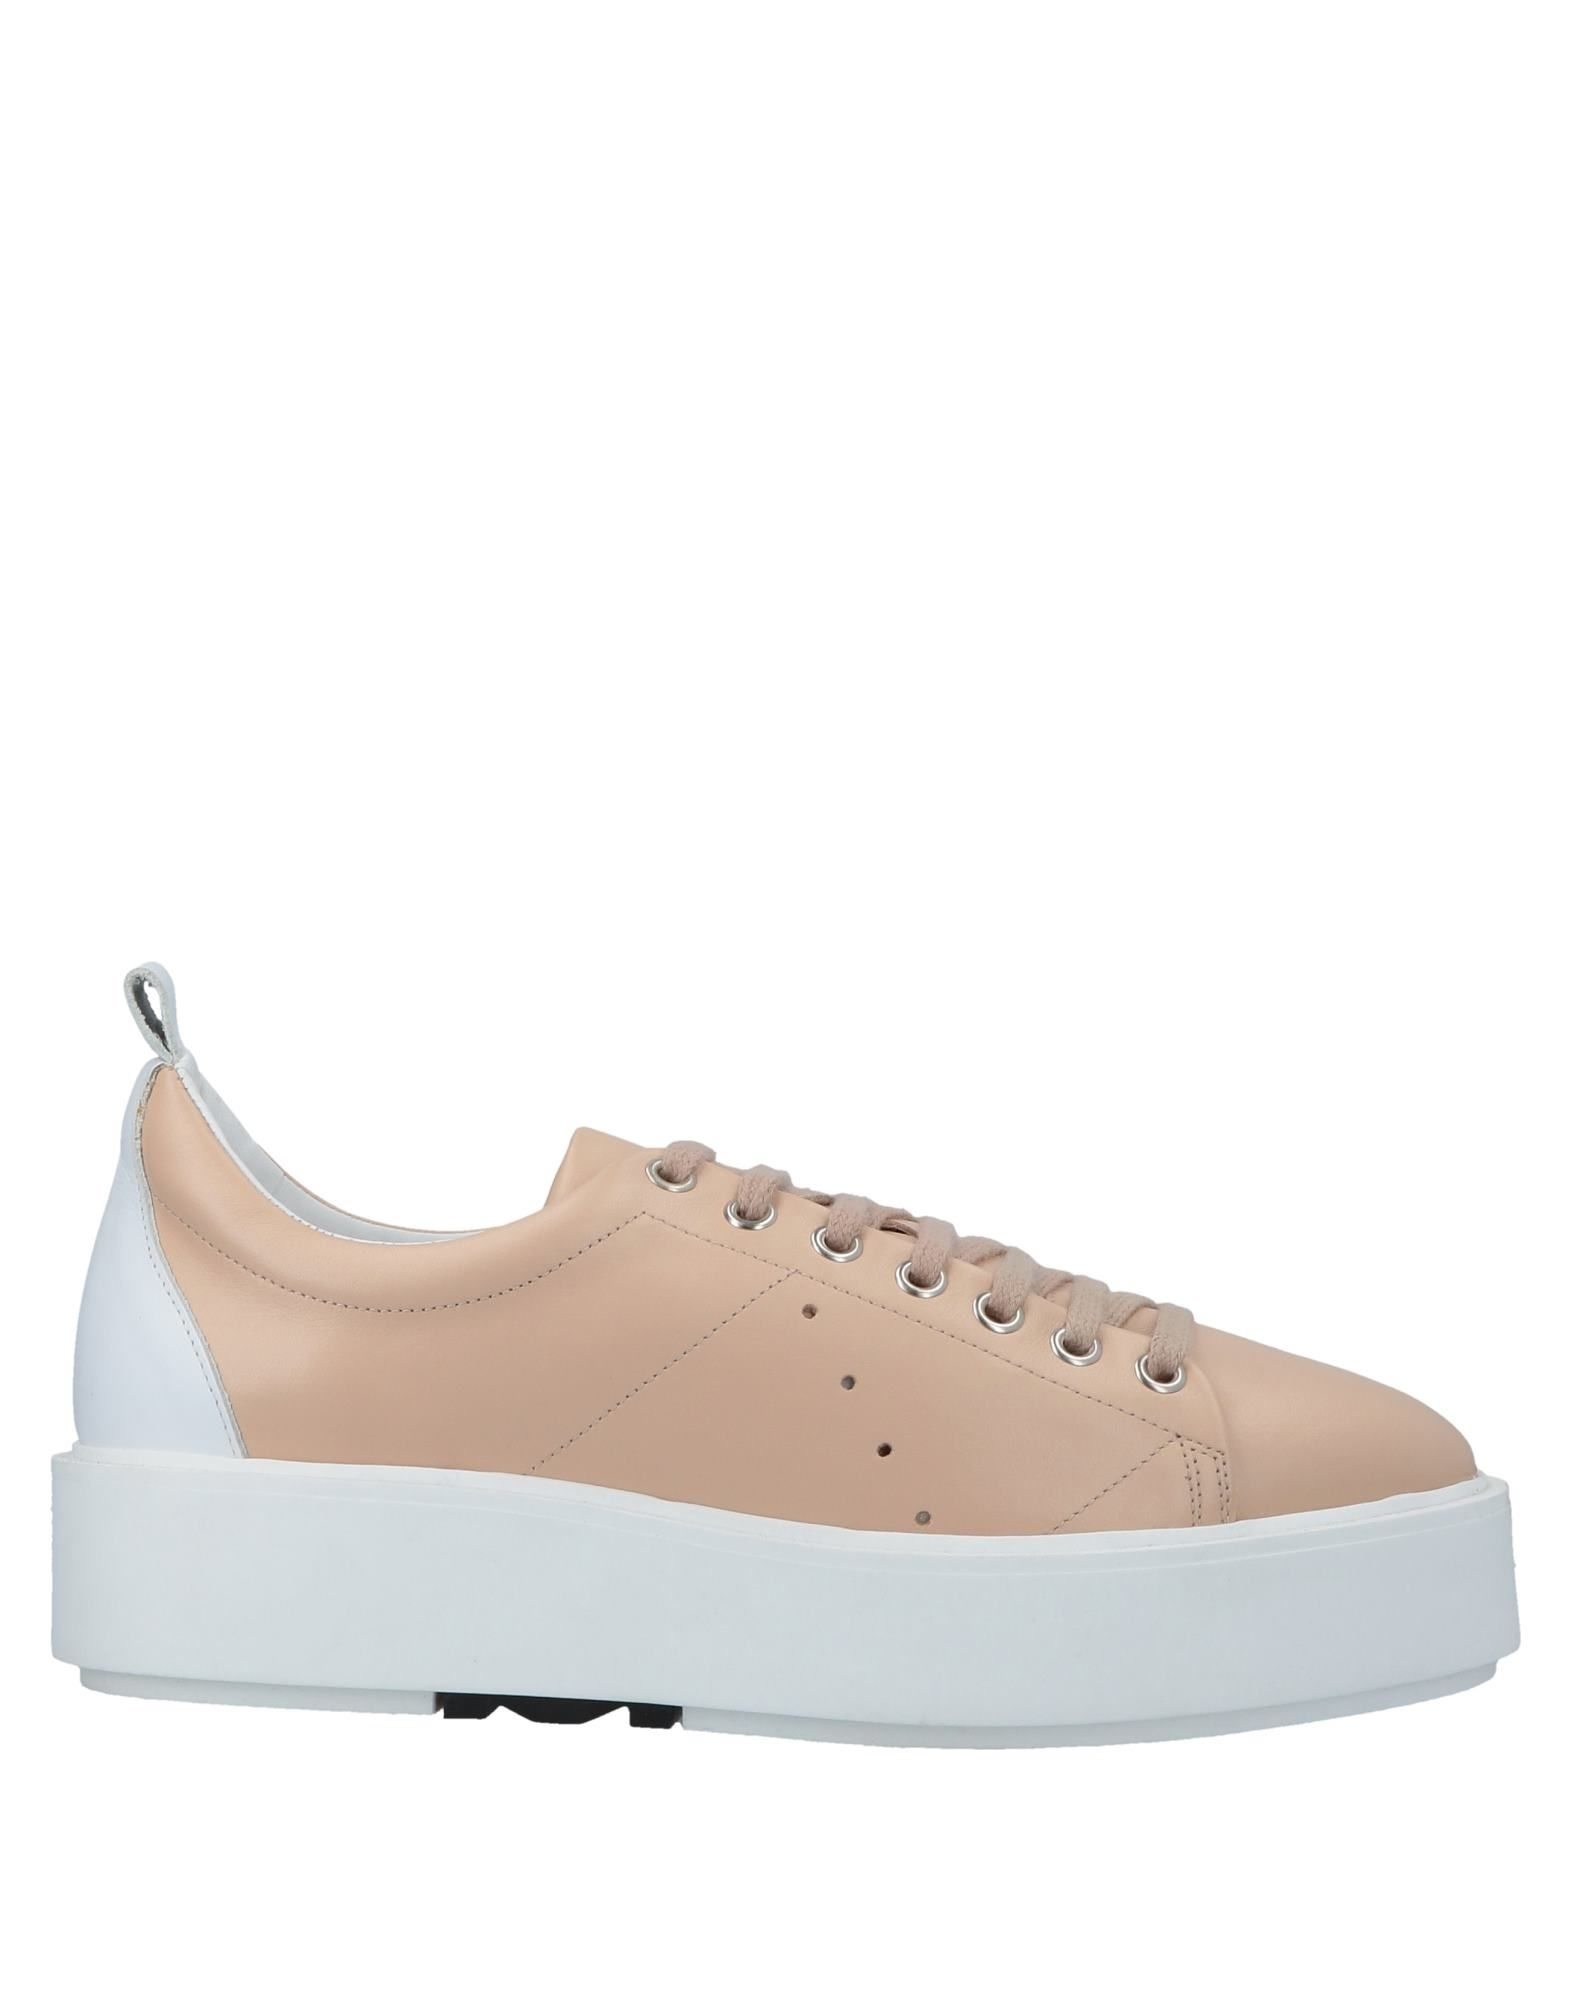 Stilvolle billige  Schuhe Morobē Sneakers Damen  billige 11584867CF d27ebb